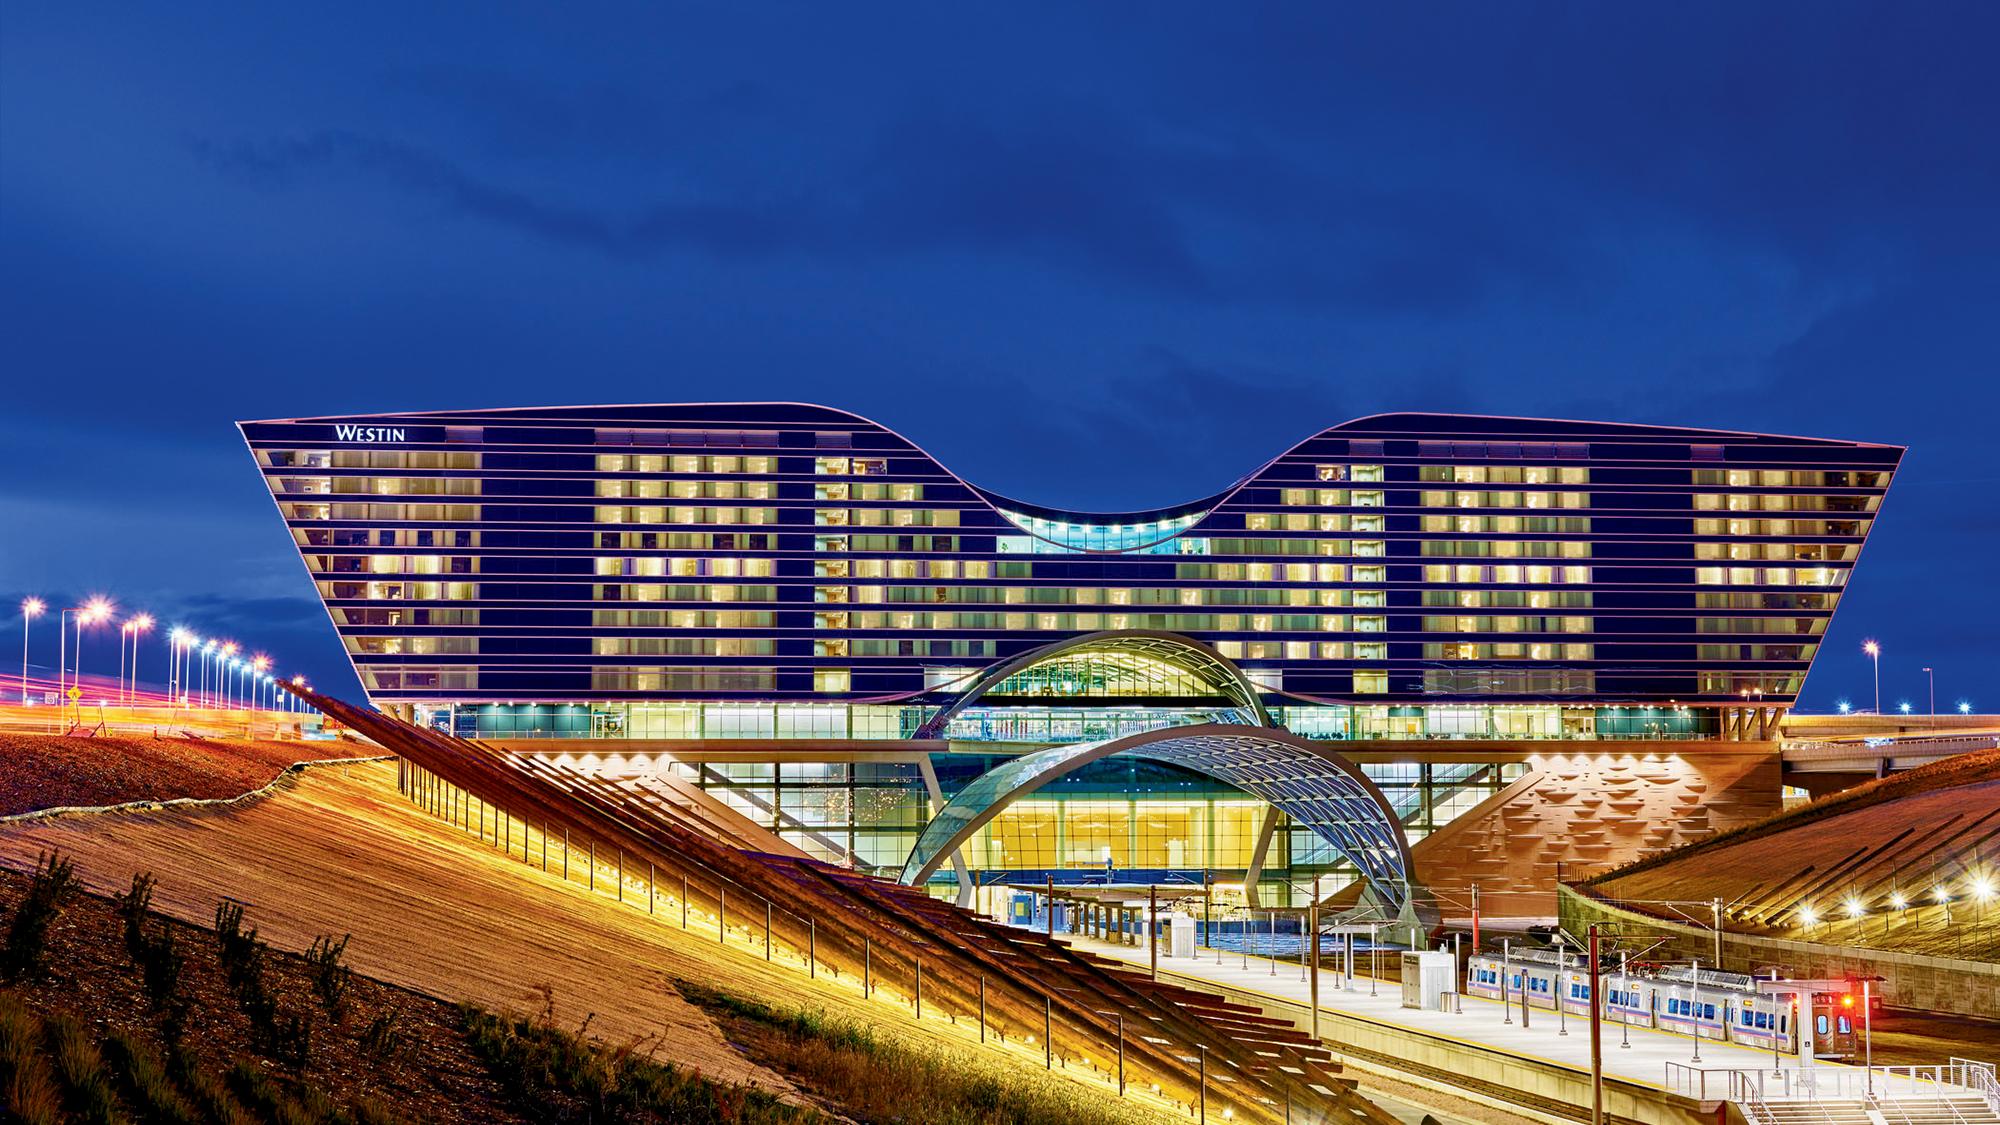 Upper Upscale Hotel Cements Denver Airport S Status